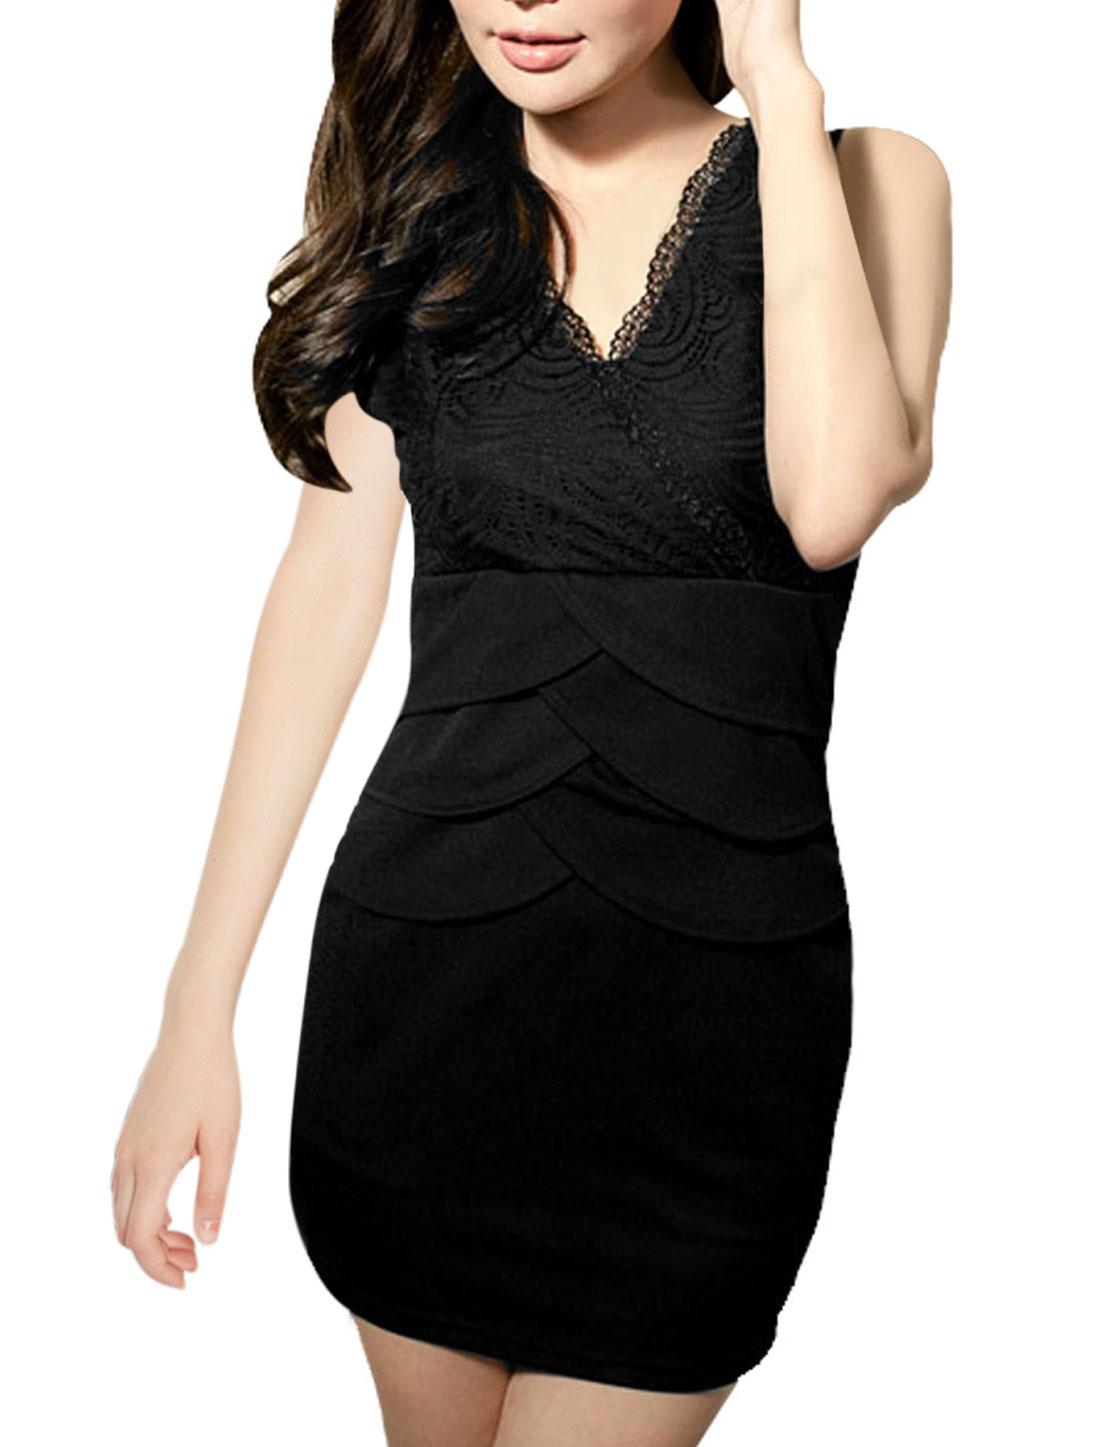 Lady Cross Front Empire Waist Black Sleeveless Mini Dress XS